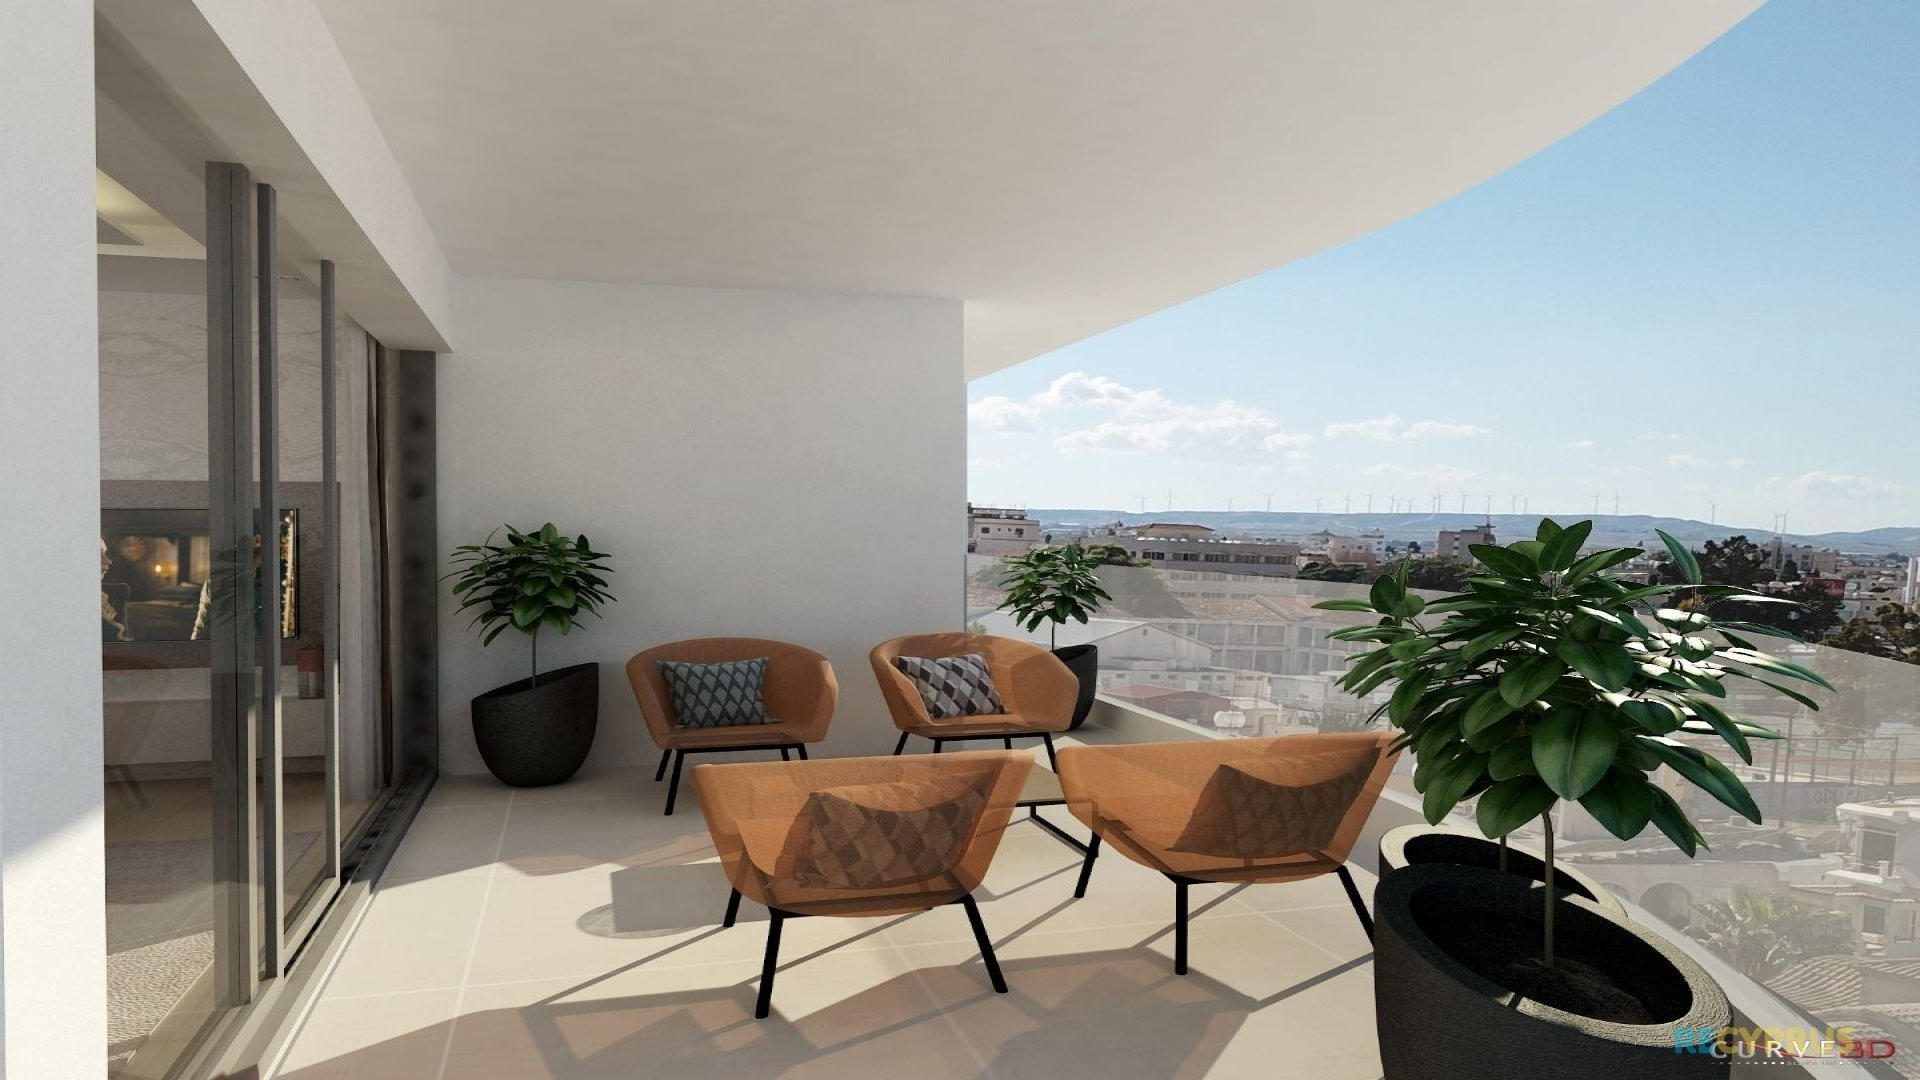 Apartment for sale City Center Larnaca Cyprus 16 3598